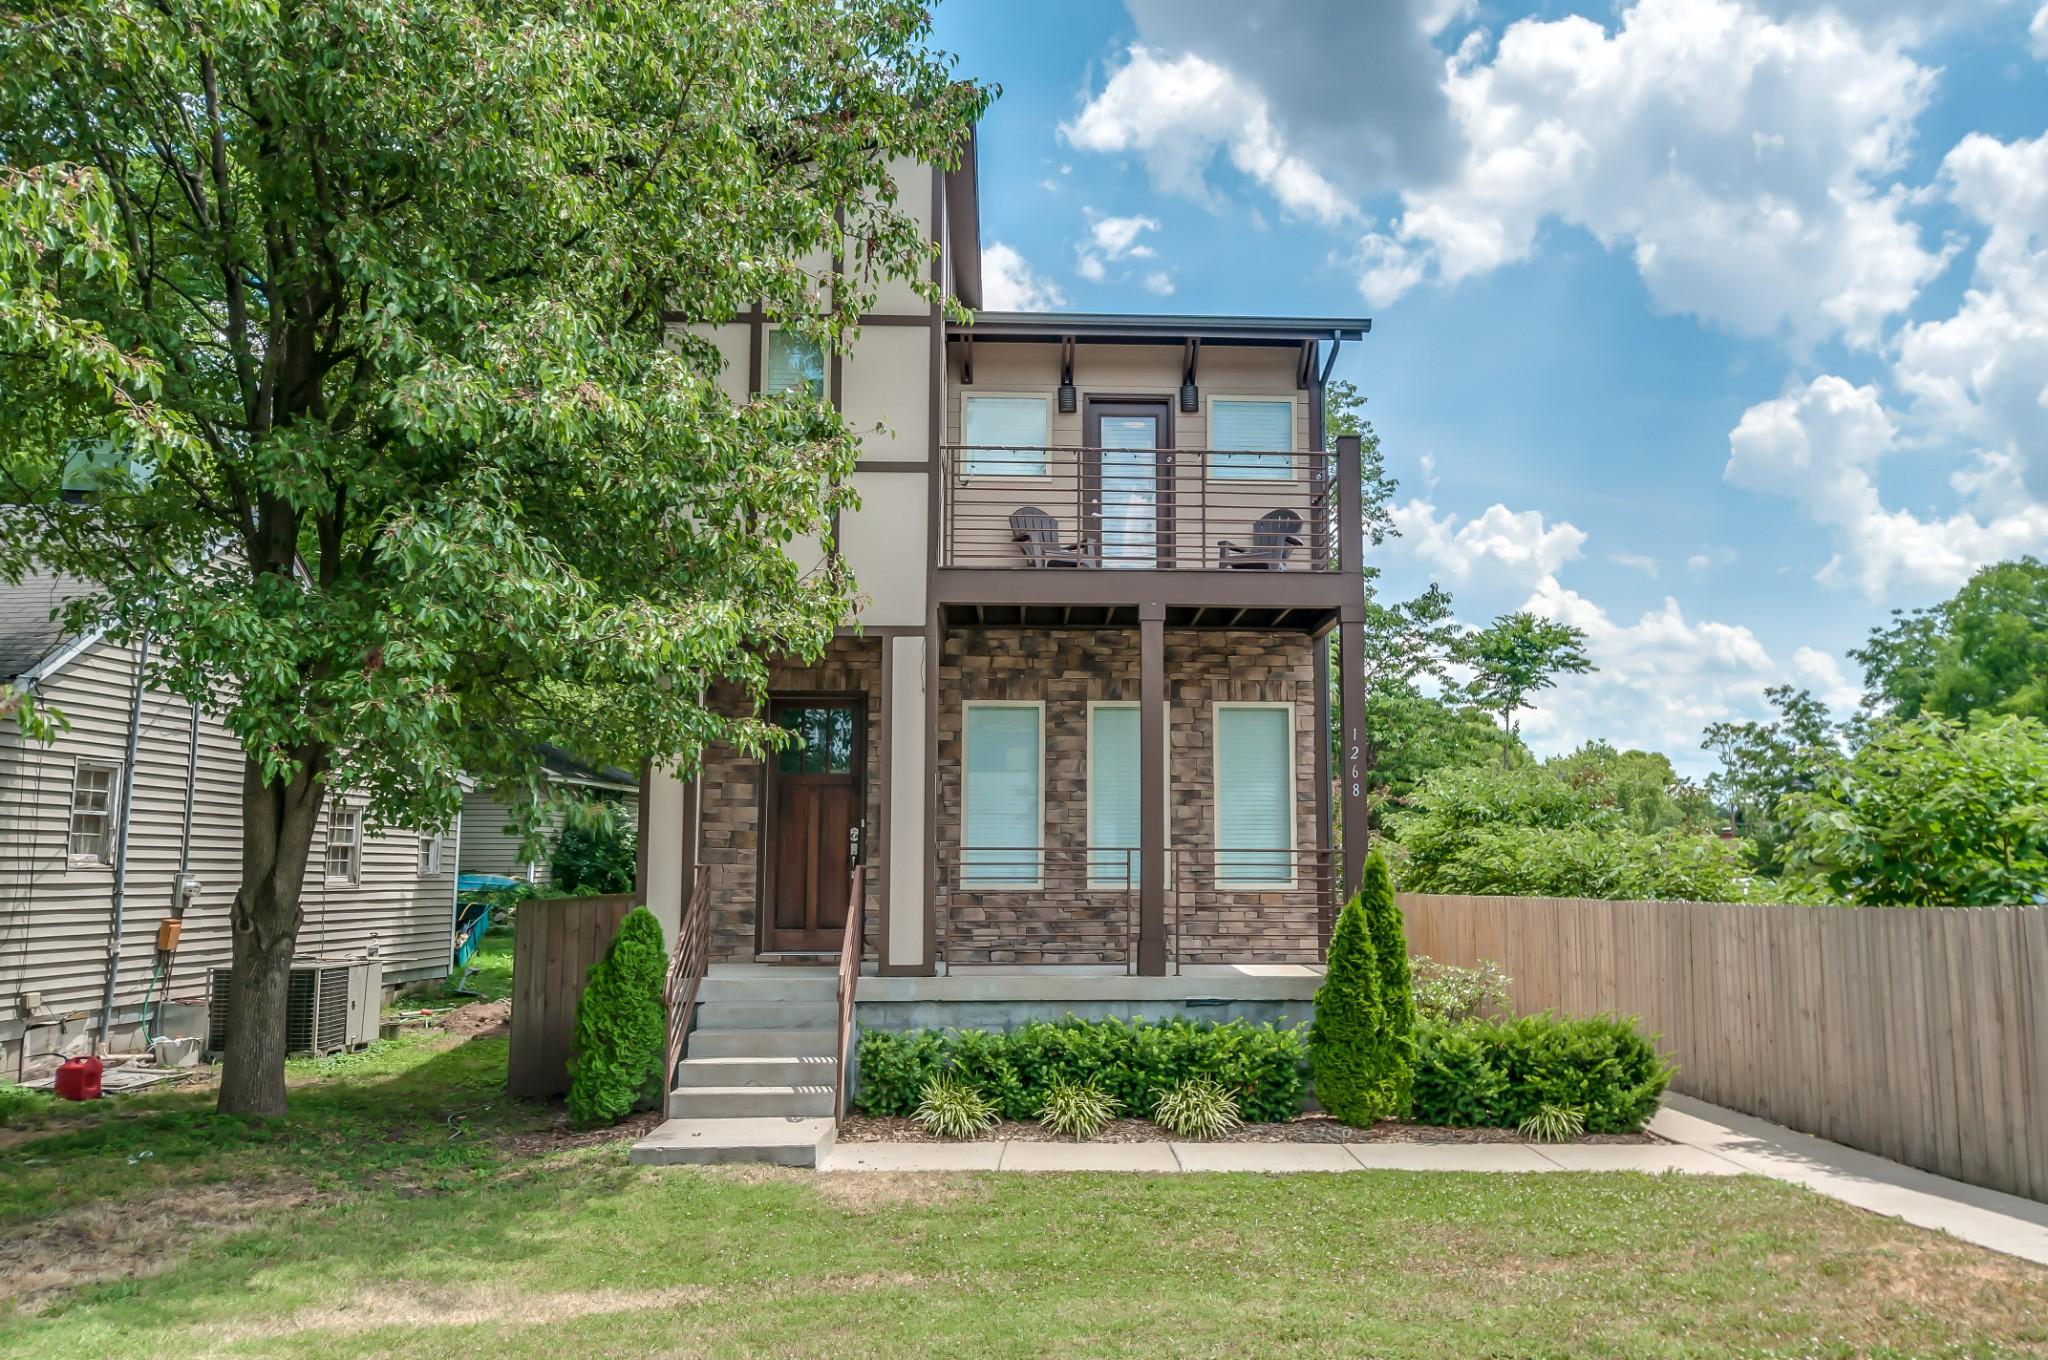 1268A 2nd Ave, S Property Photo - Nashville, TN real estate listing